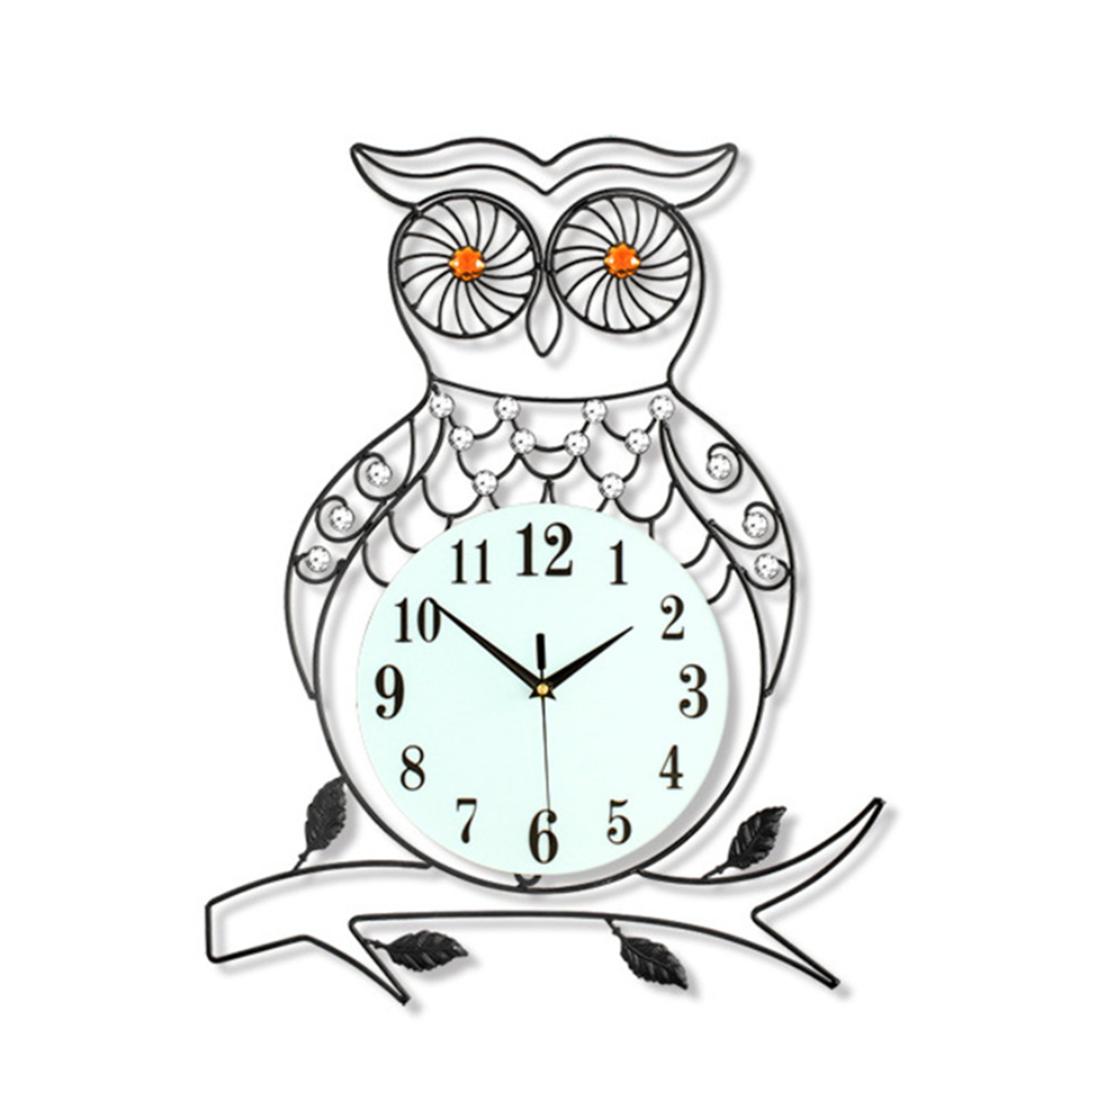 This fashionable large d owl bird design wall clock looks luxury